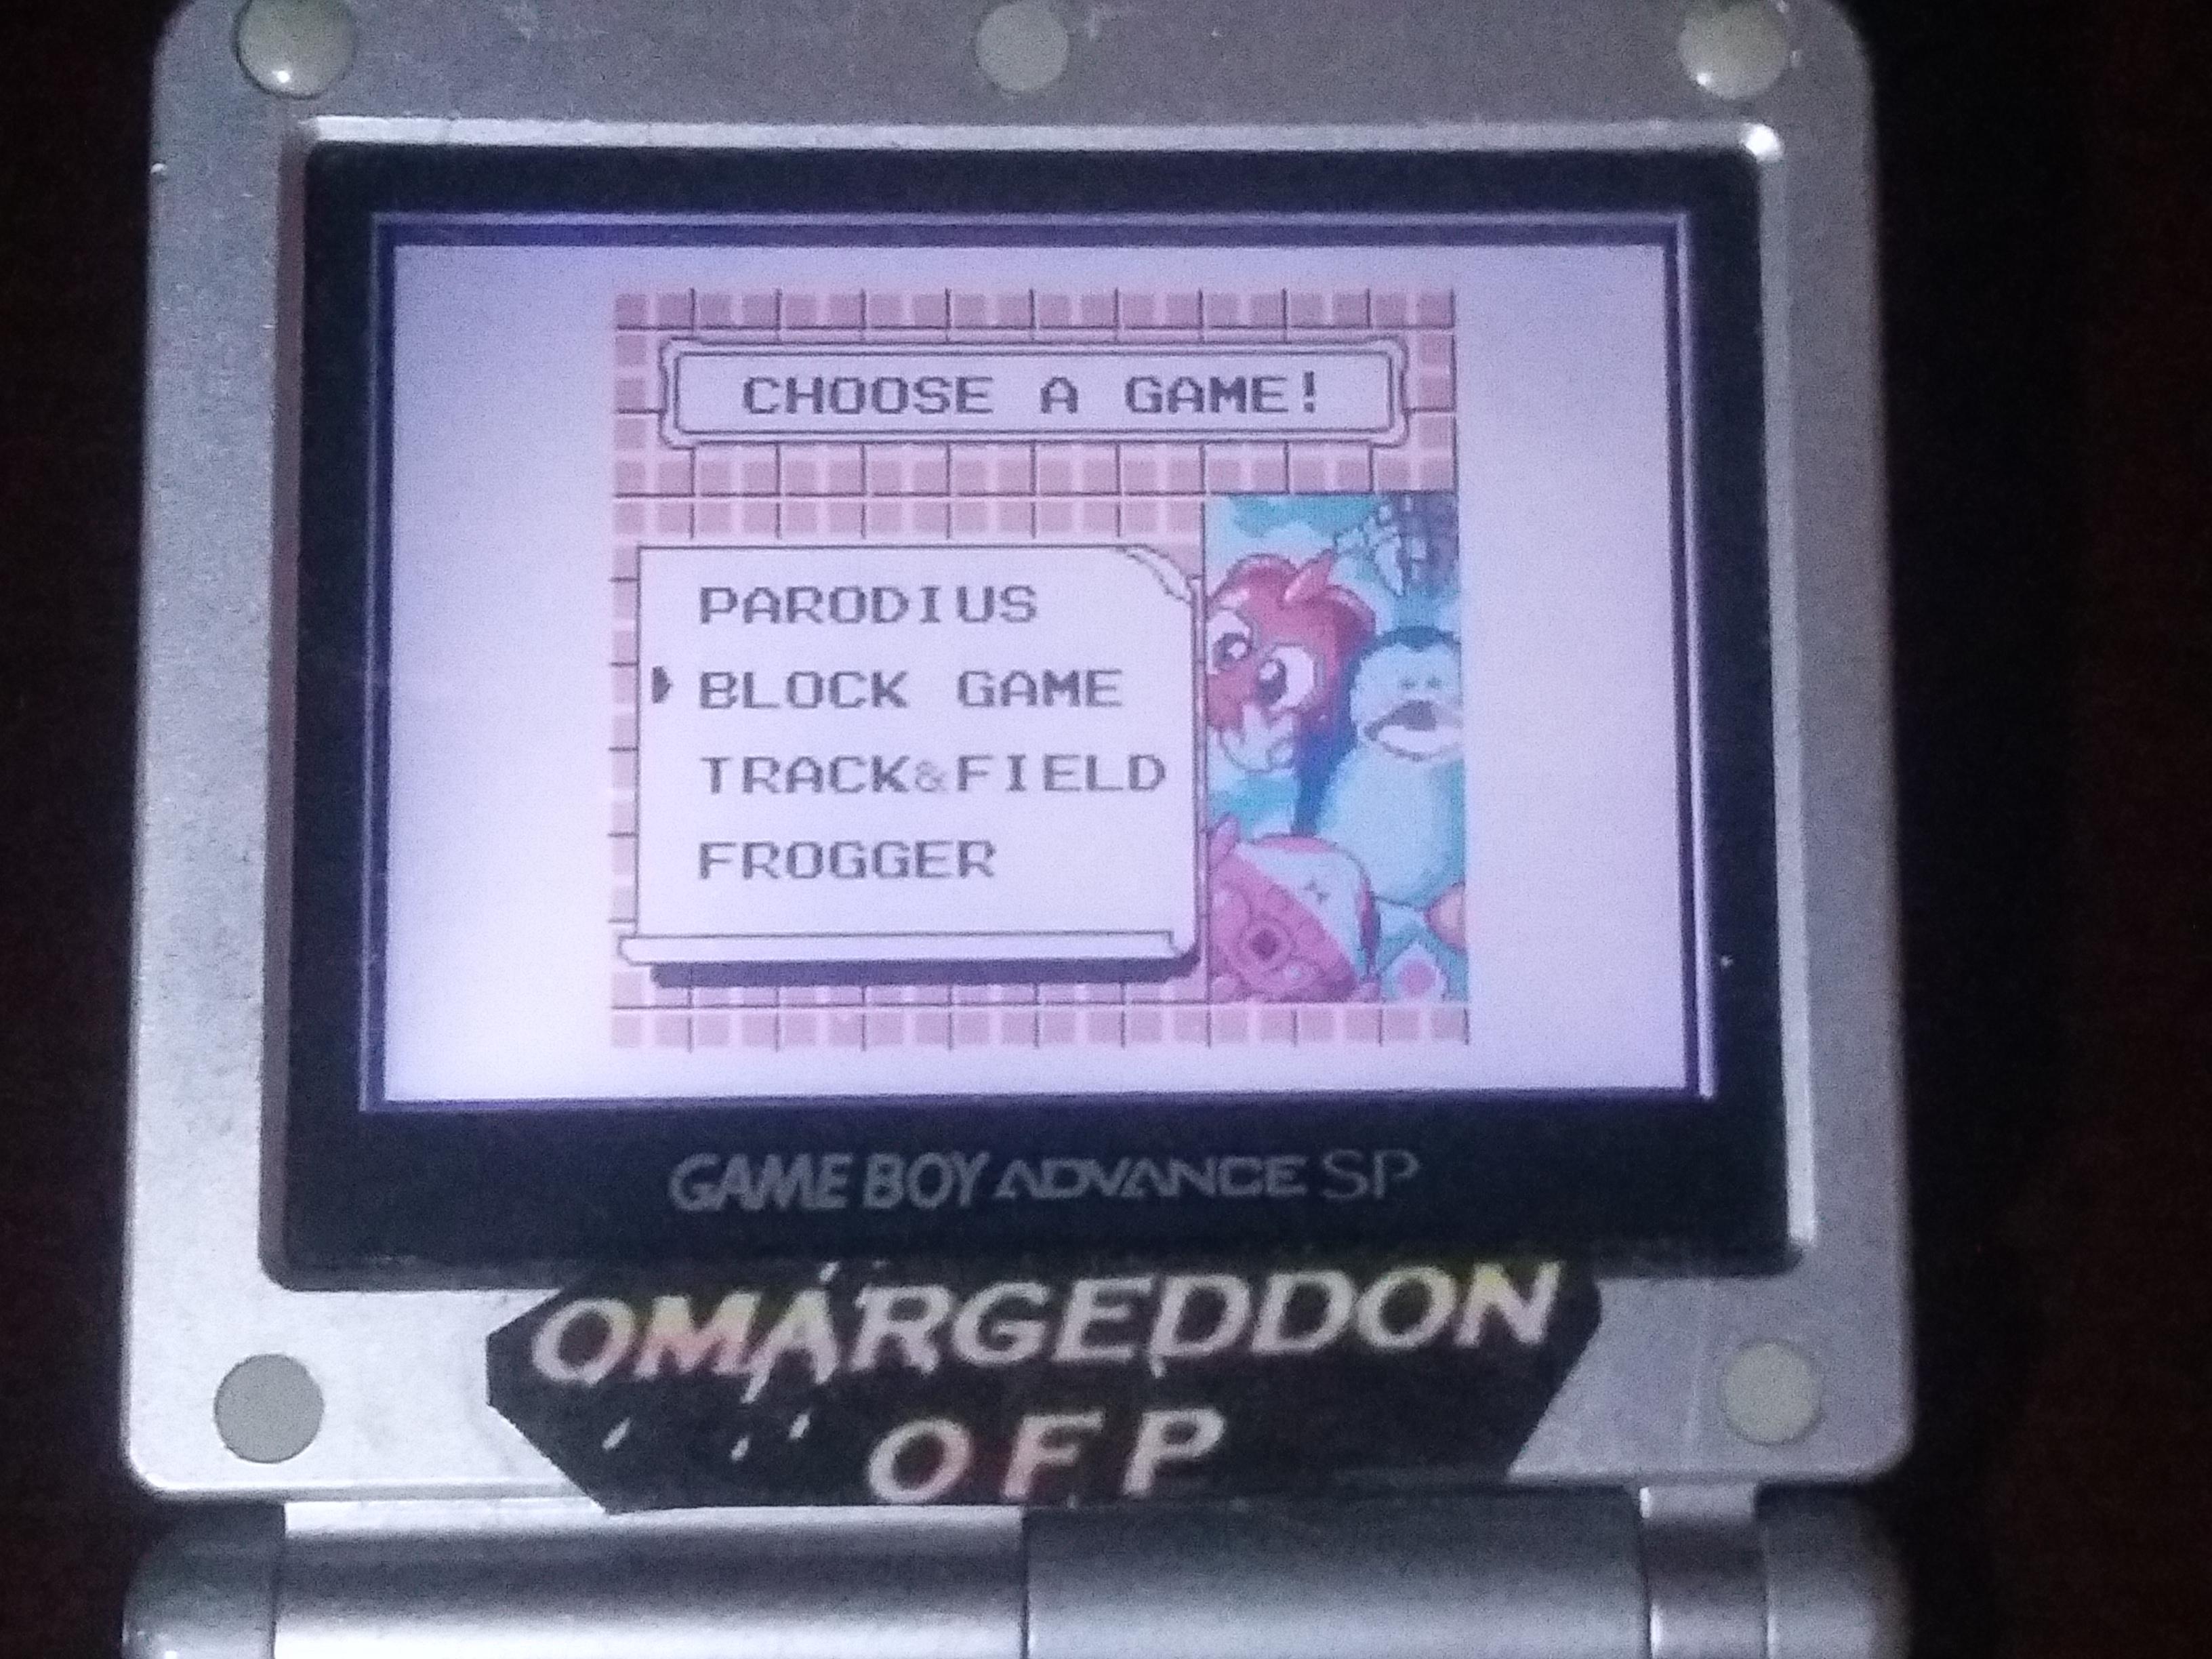 omargeddon: Konami GB Collection Vol. 2: Block Game (Game Boy Color) 35,240 points on 2018-03-03 13:23:02